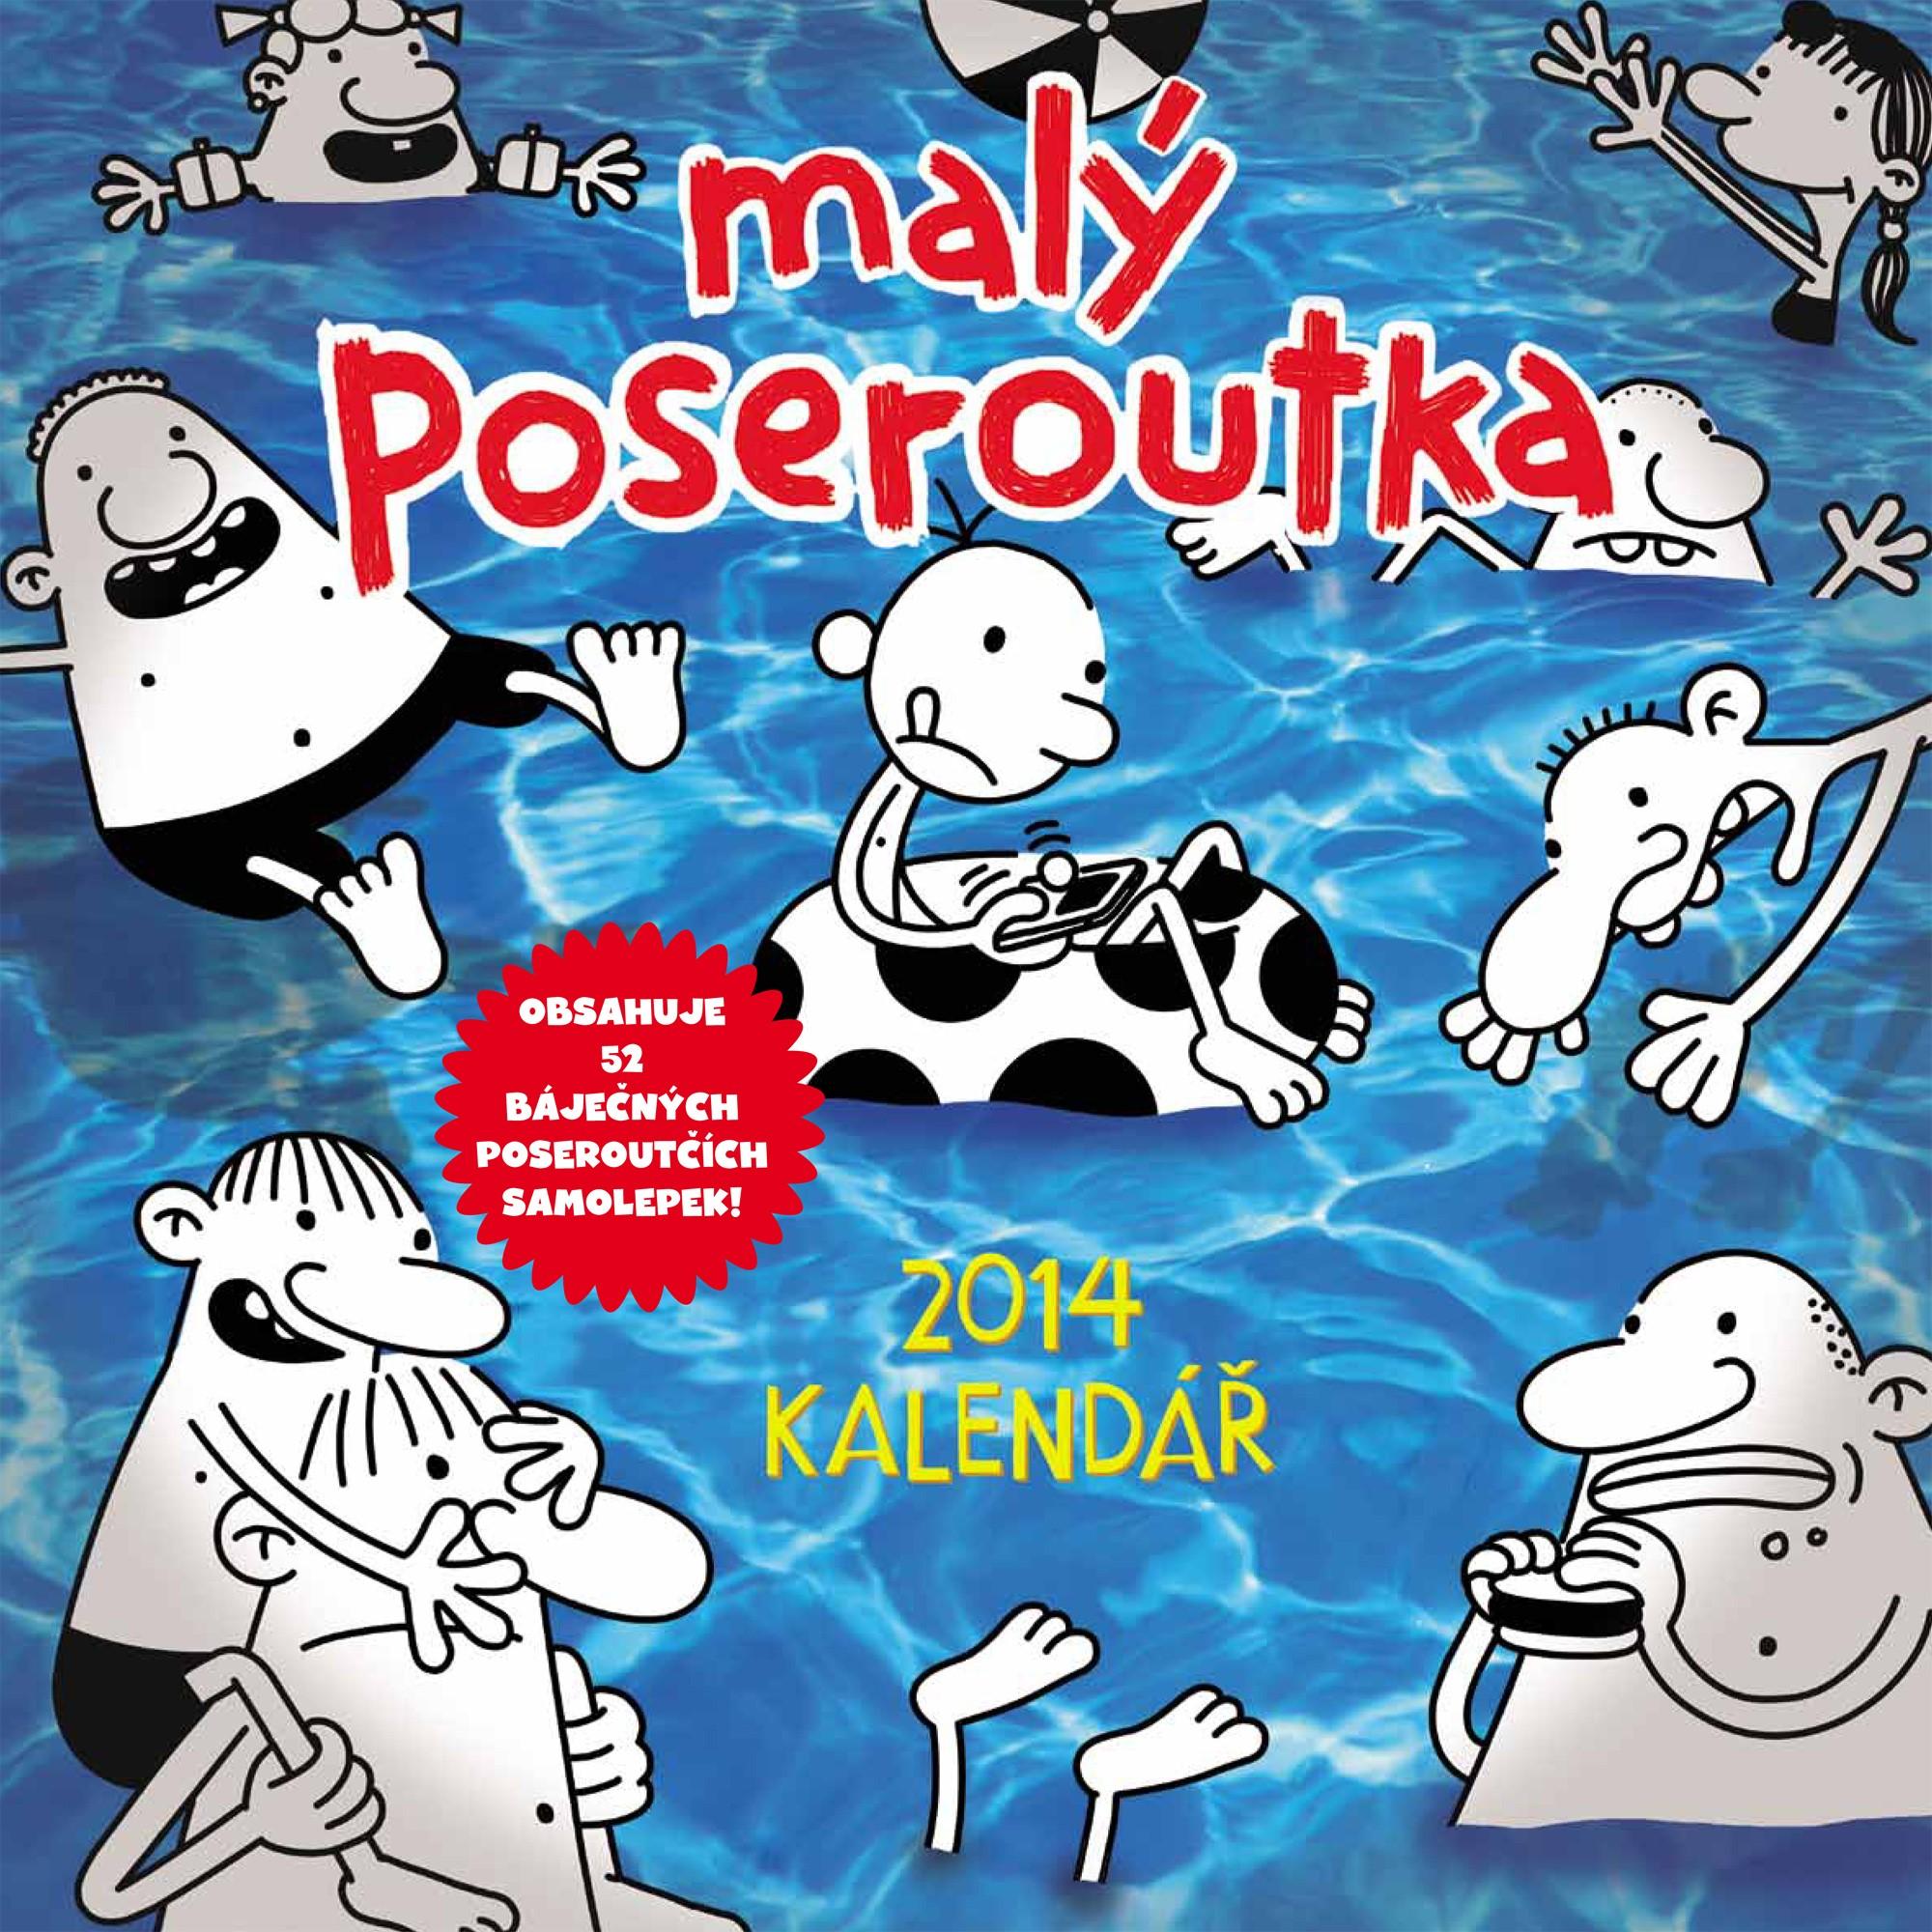 Kalendář malého poseroutky 2014